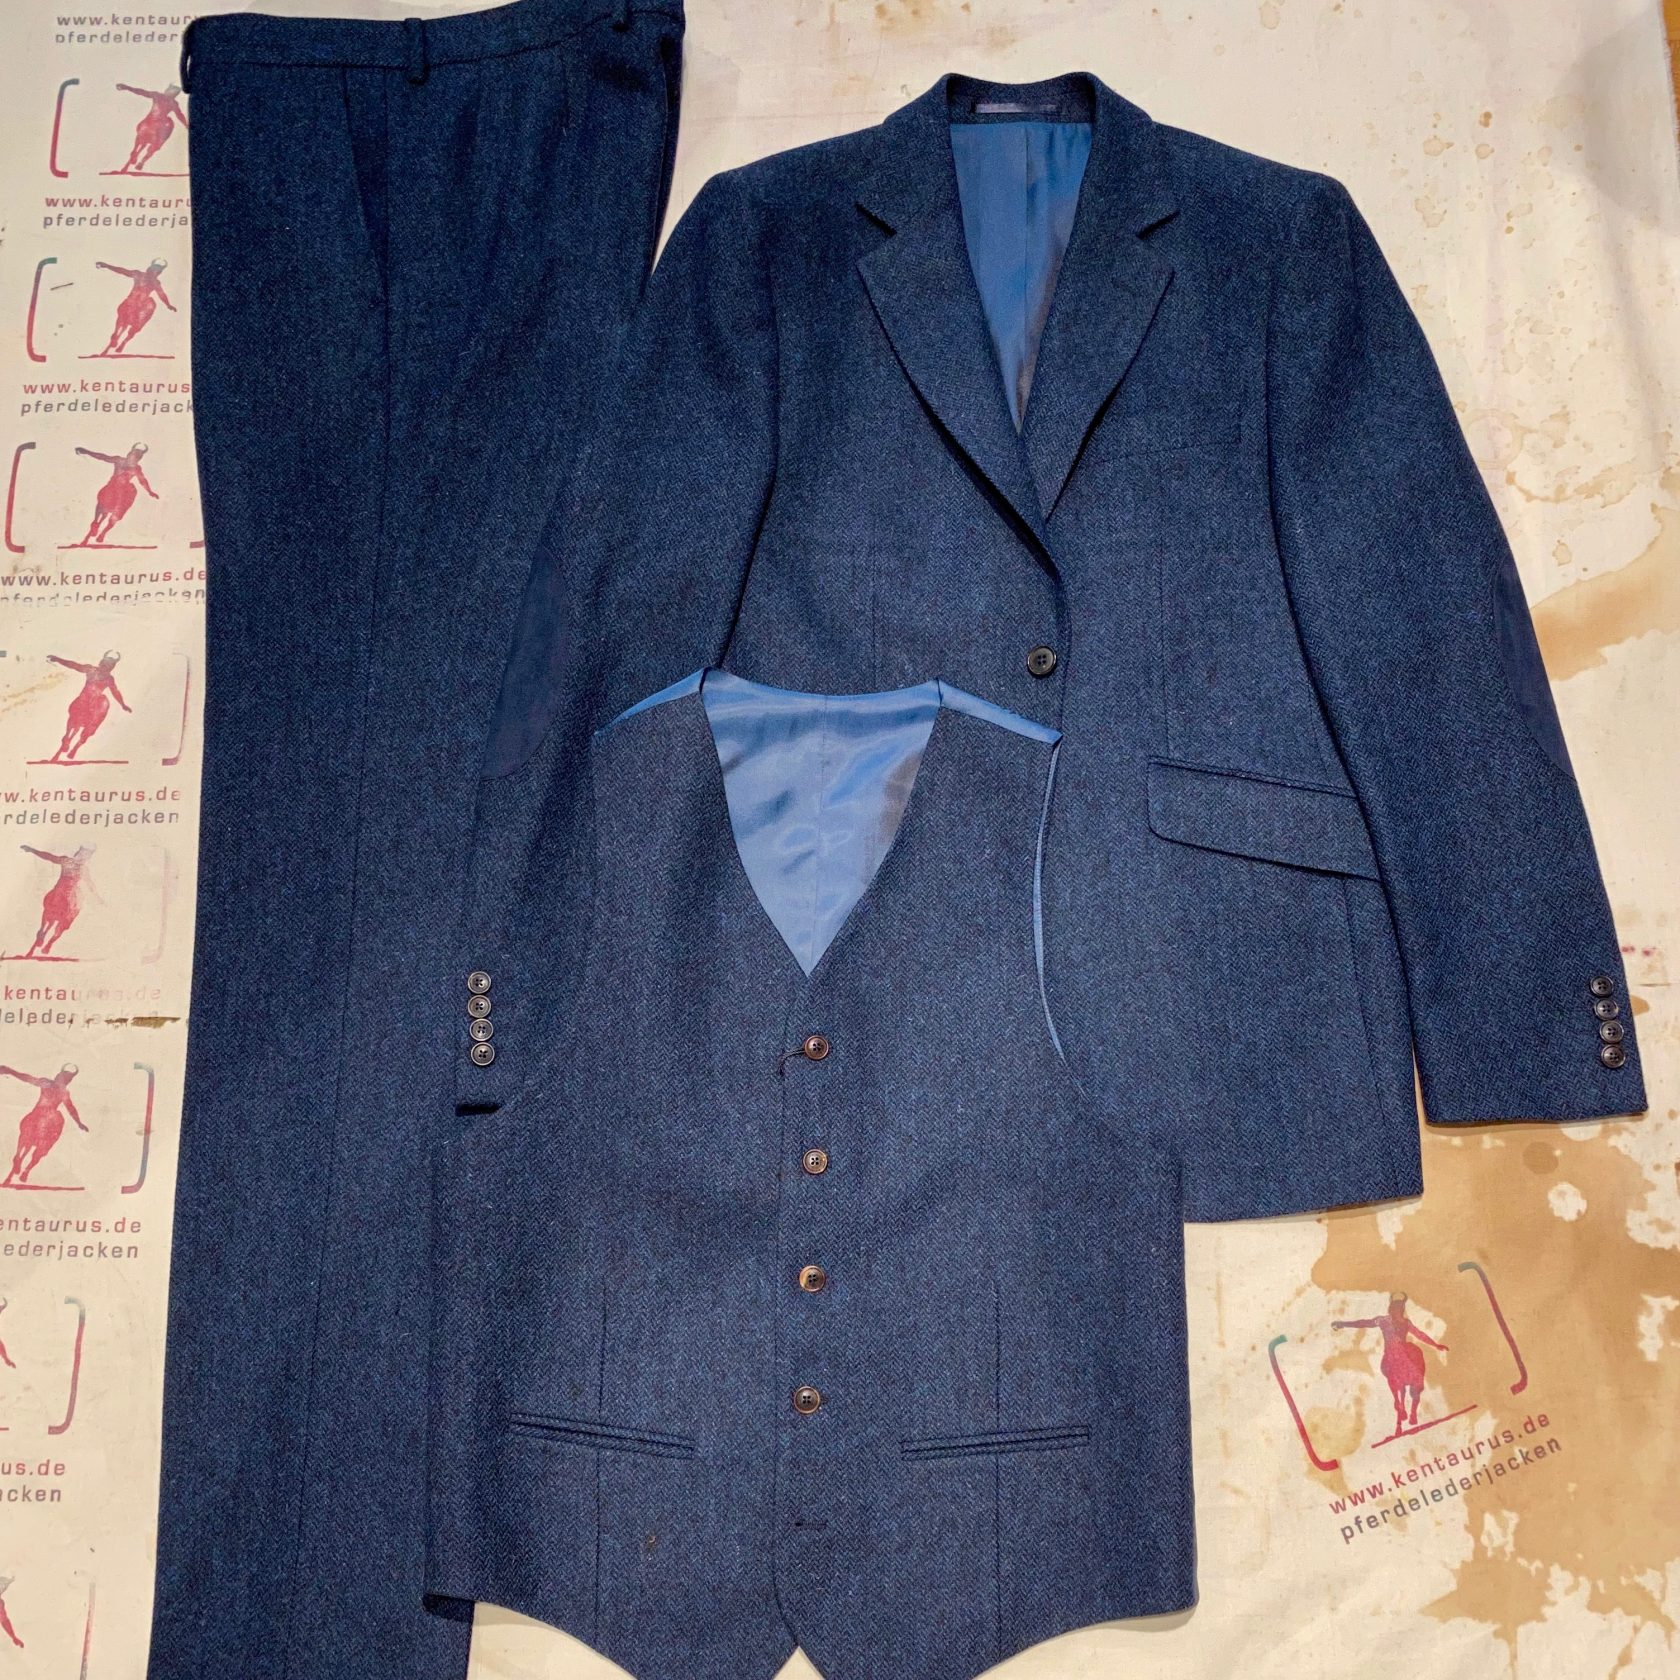 Walker& Slater 3 piece suit Martin